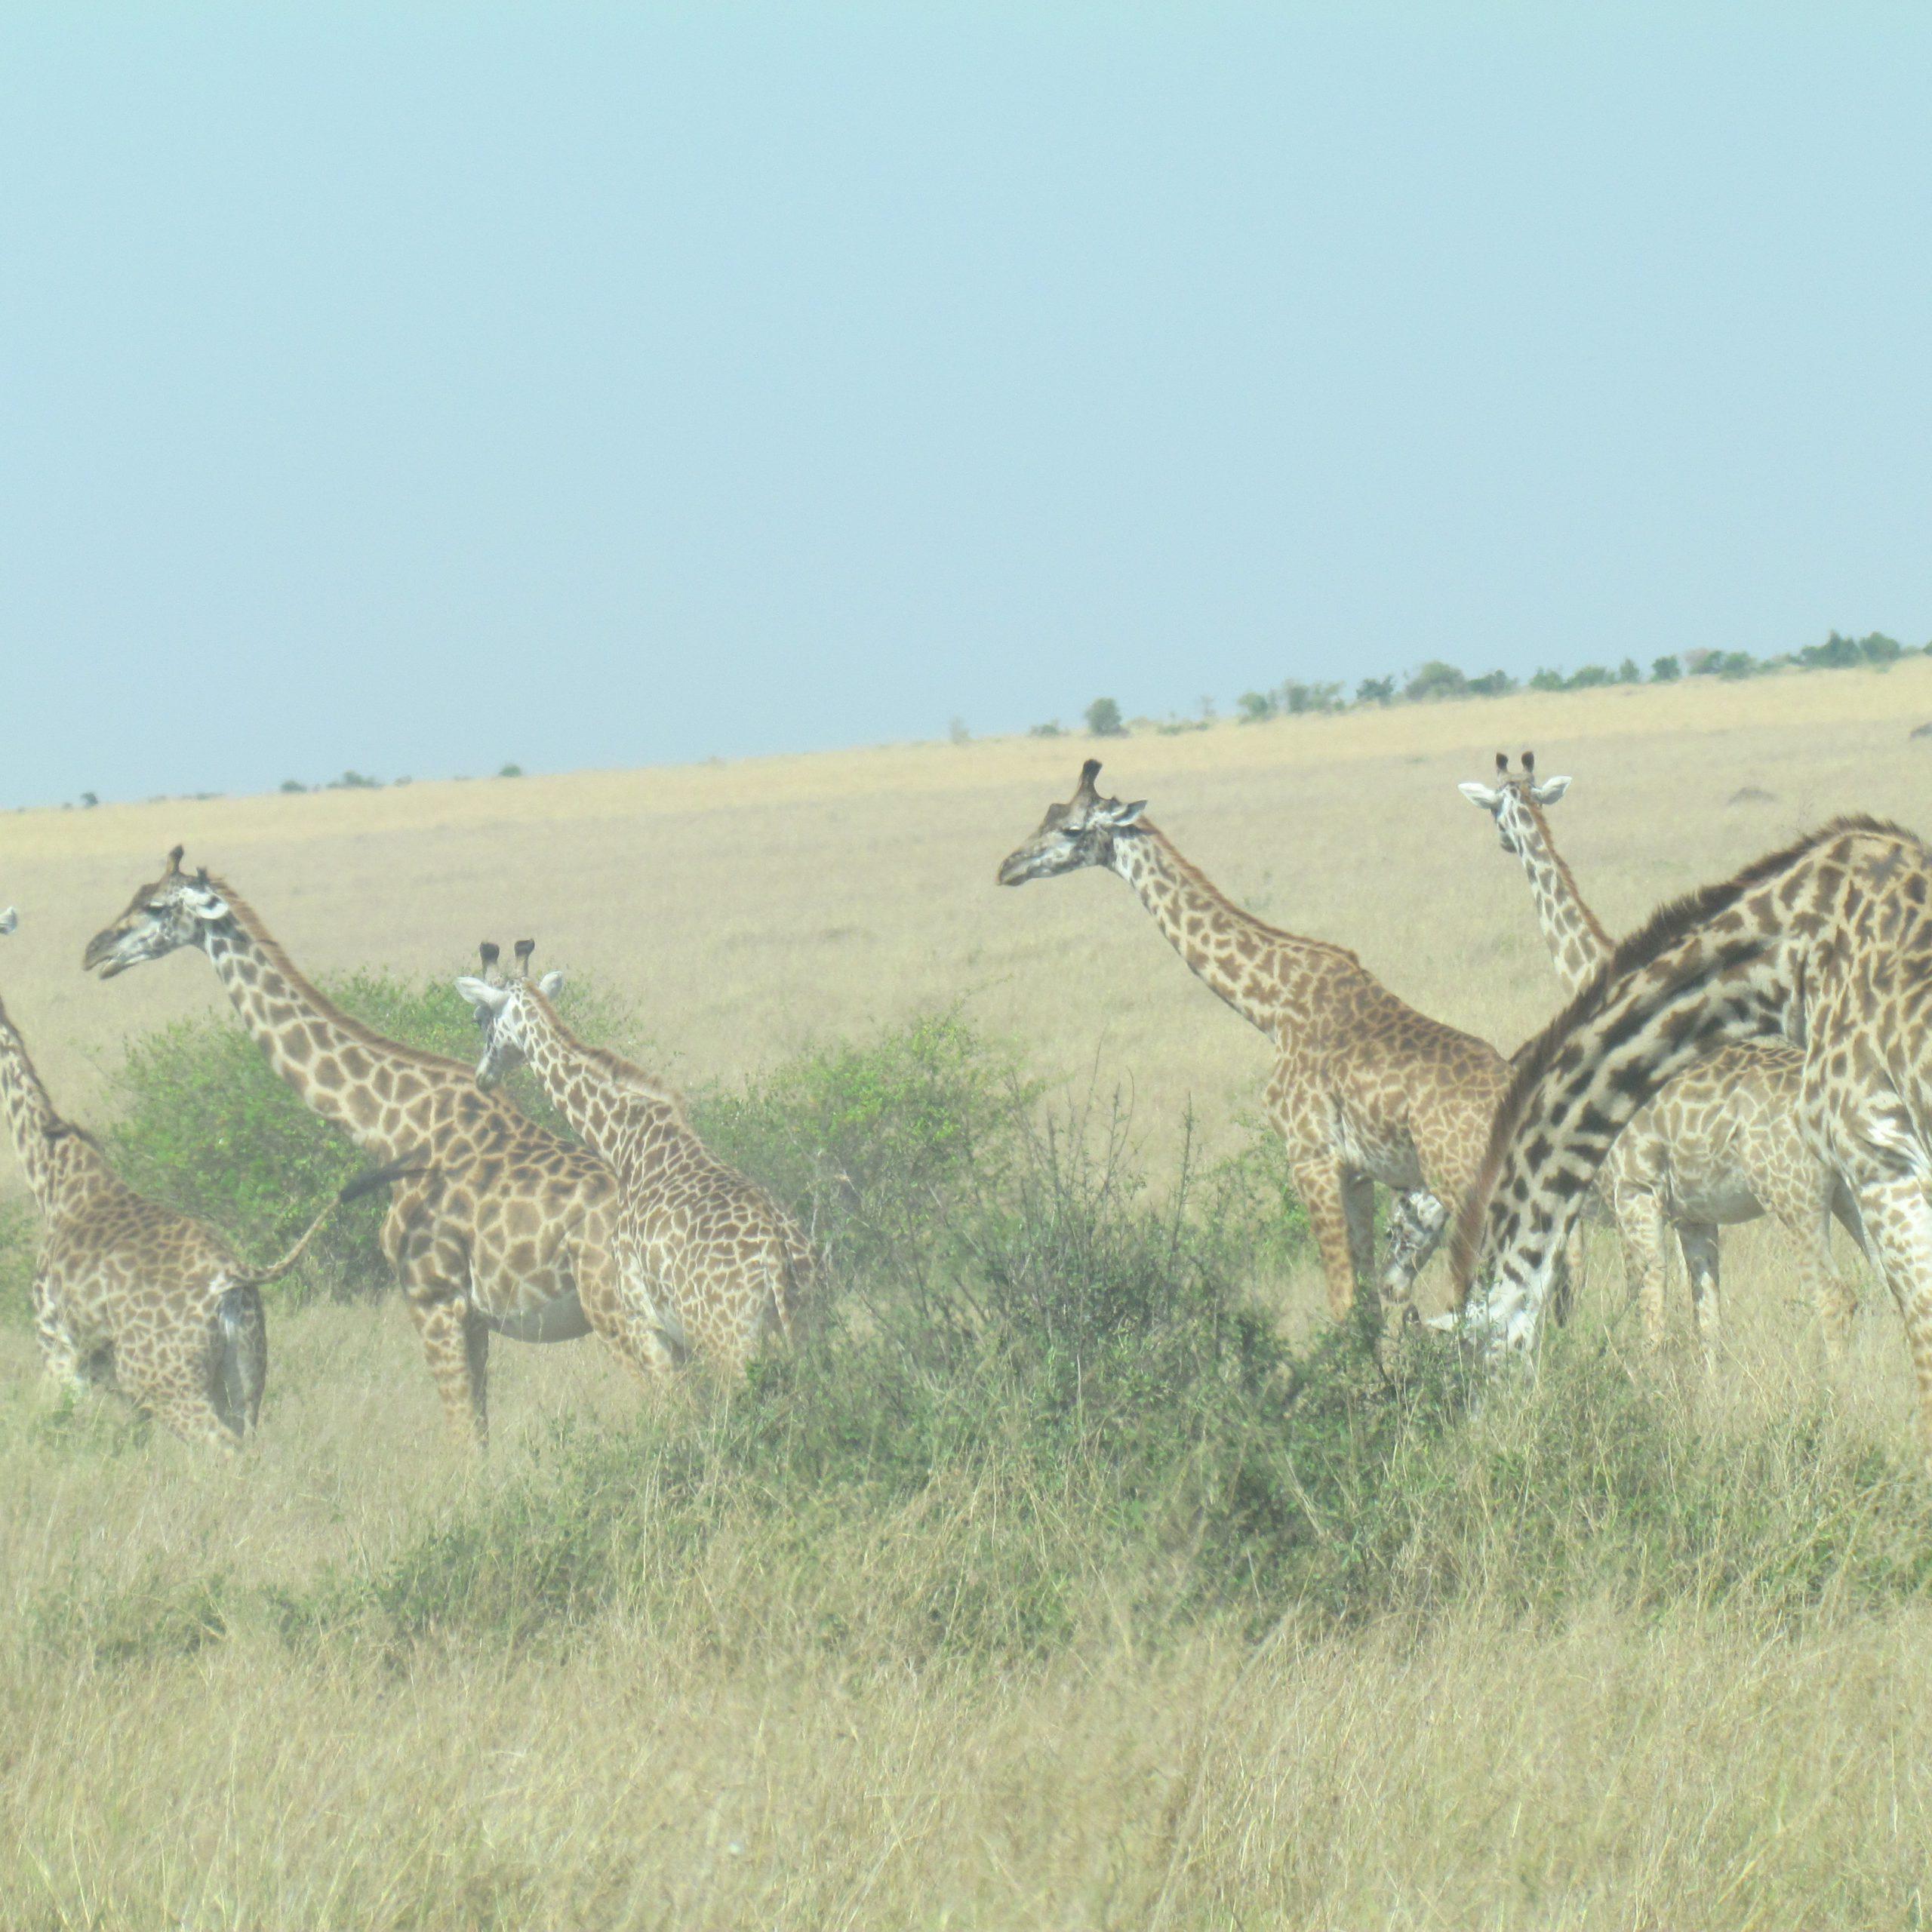 Day 5: Masai Mara NR to Isbania-Sirari Border Entry Point to Tanzania then to Serengeti National Park